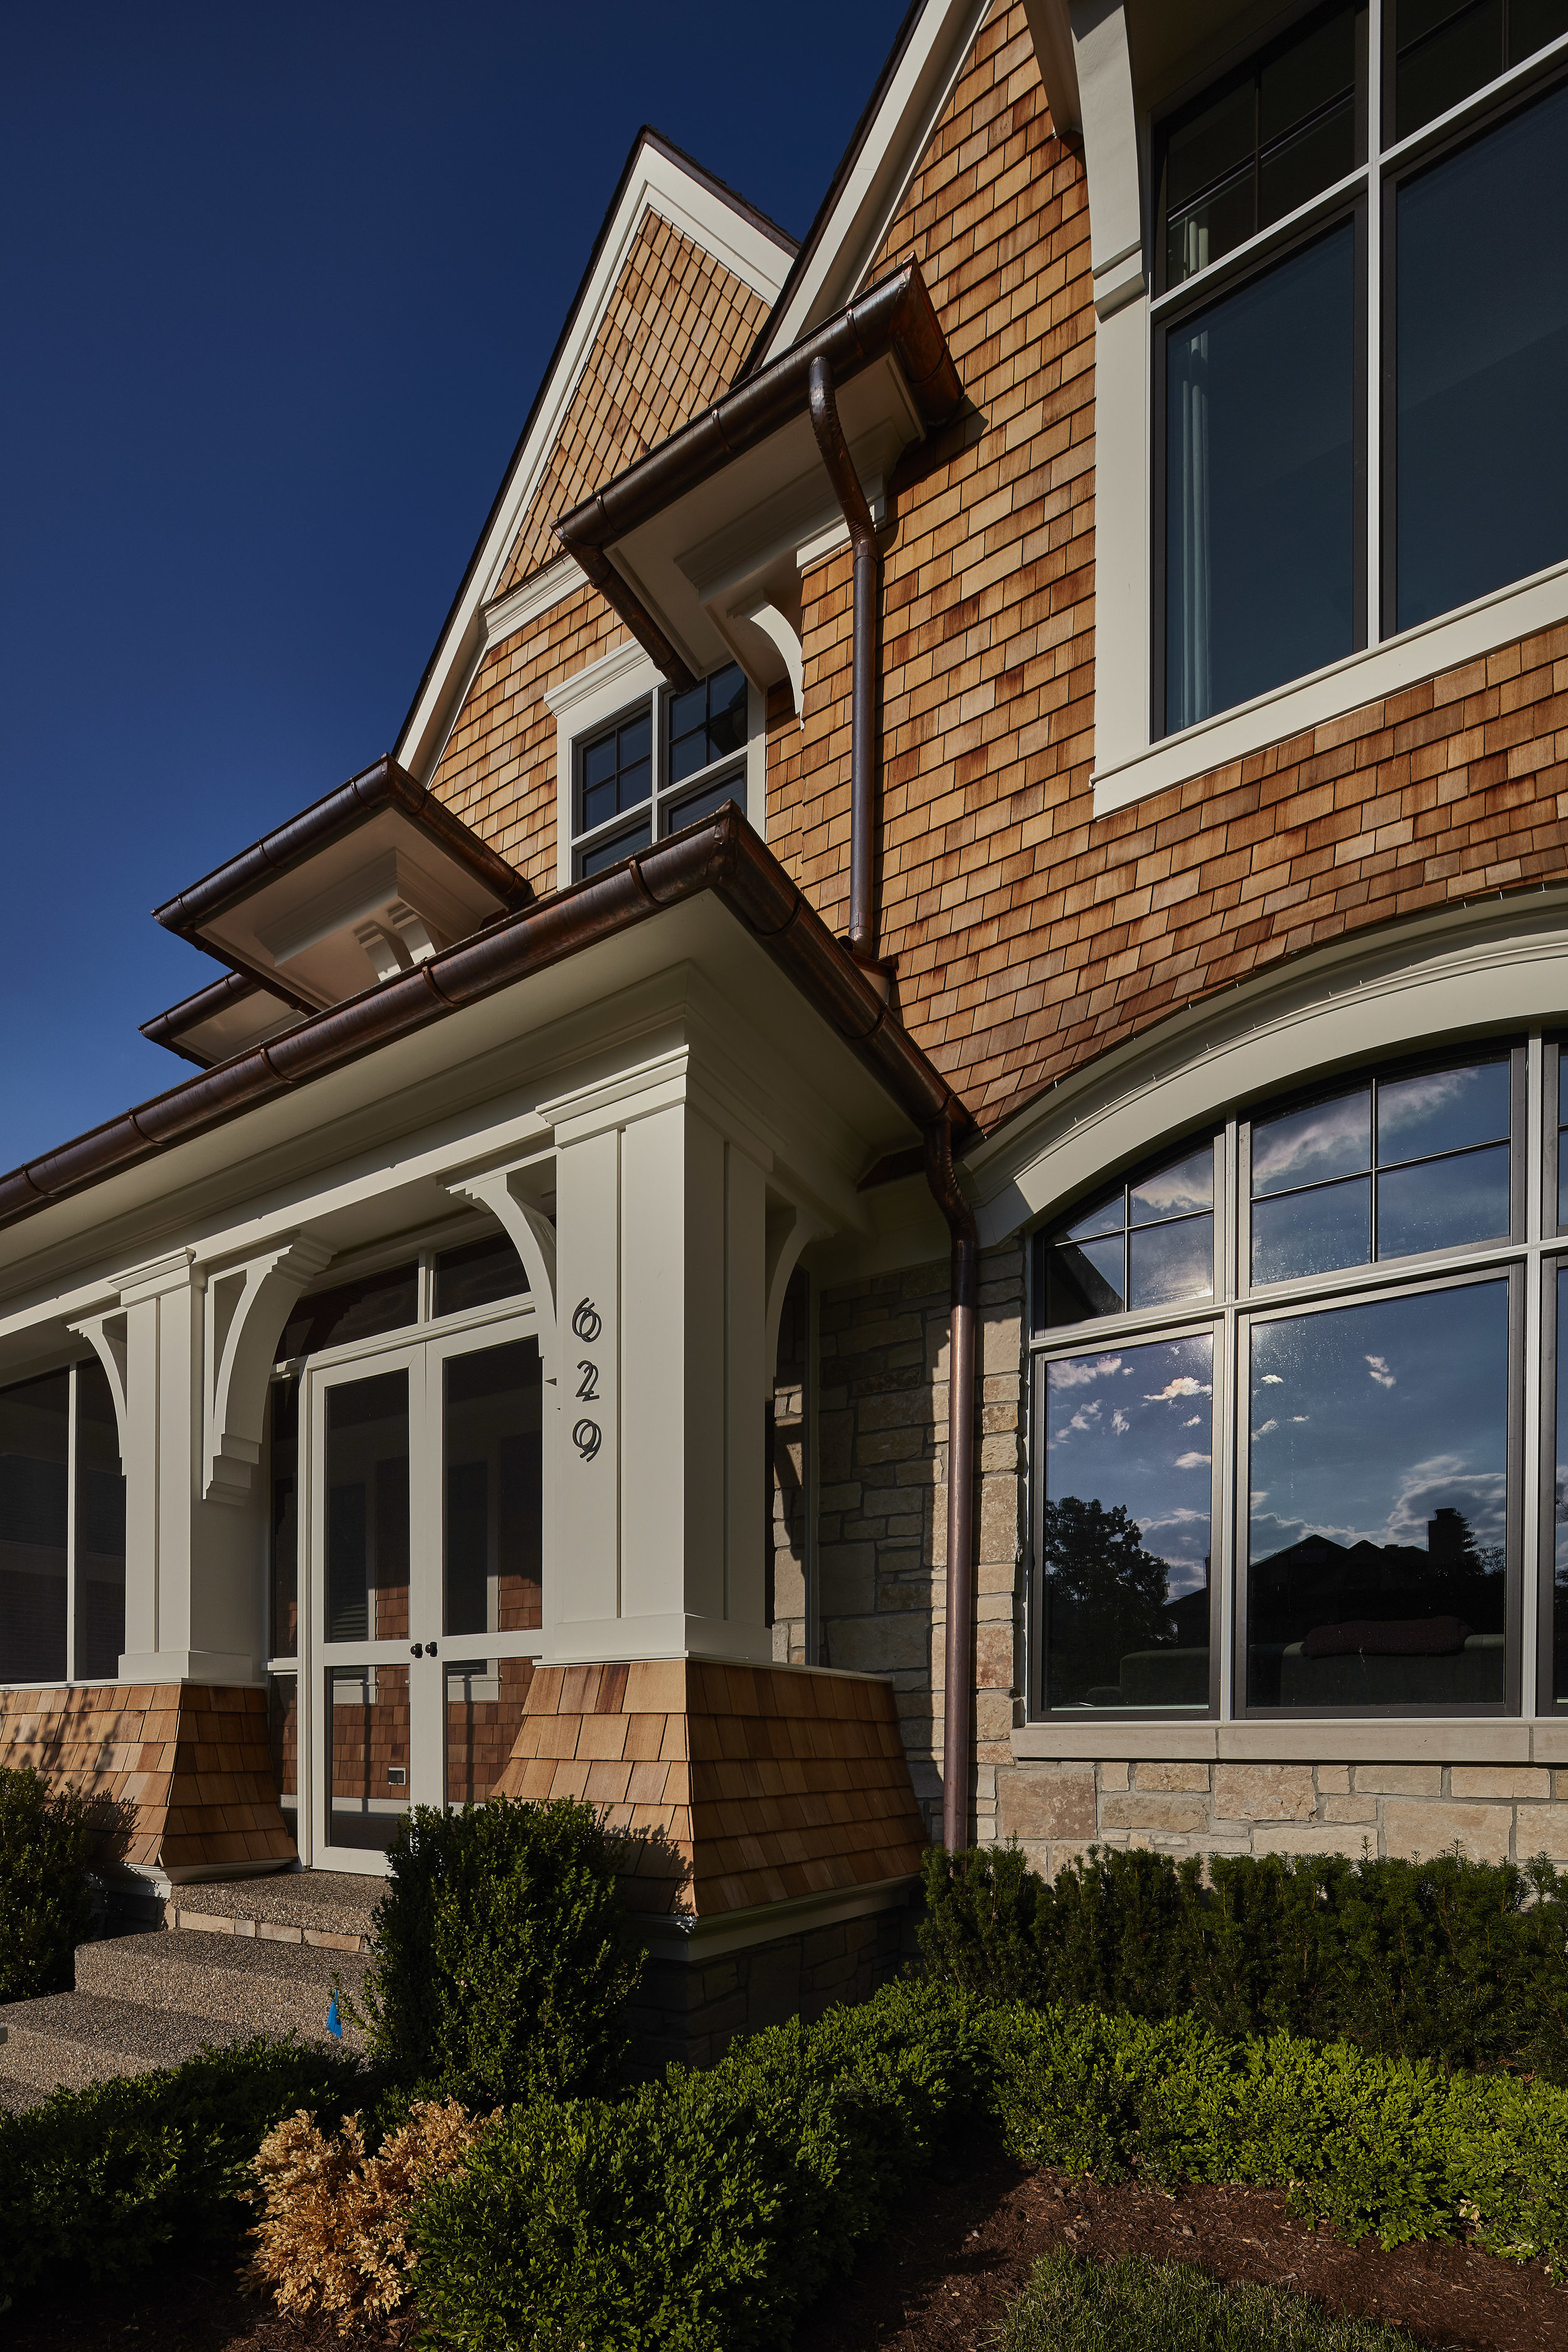 7-19-18-HM-Homes-629 Pierce-exteriors-0607-overall.jpg